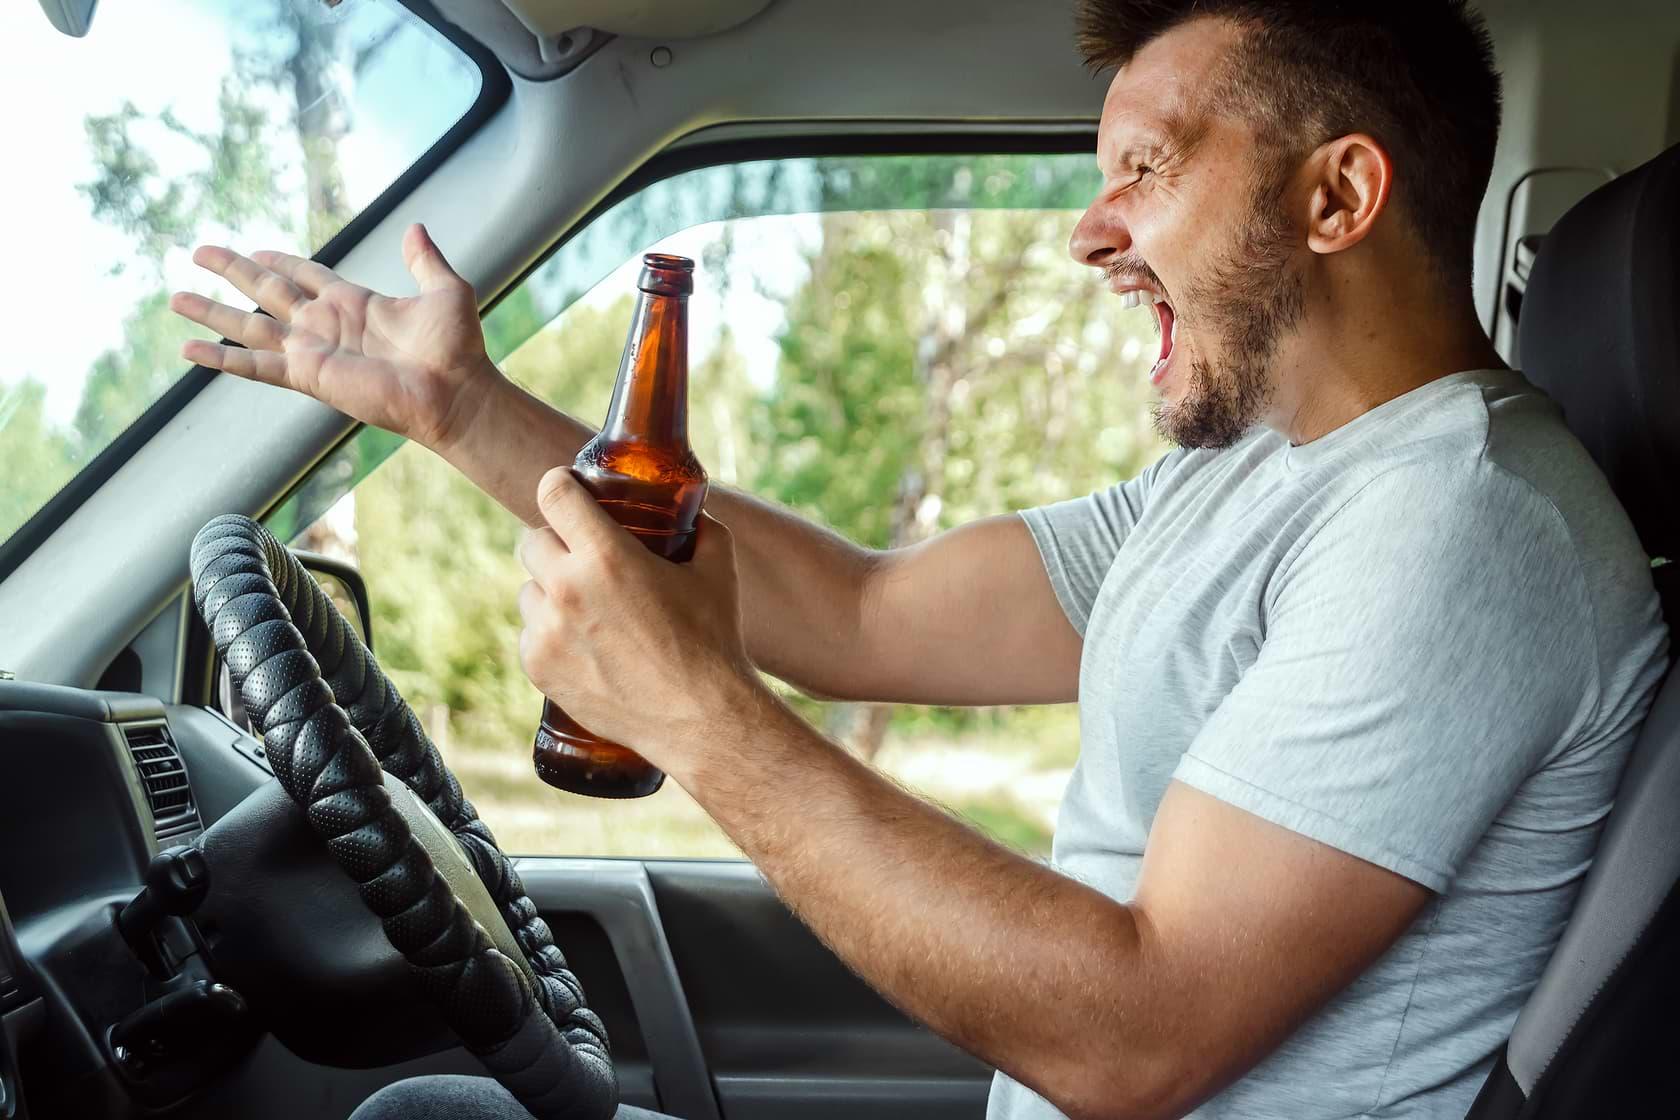 estado de ebriedad e influencia del alcohol